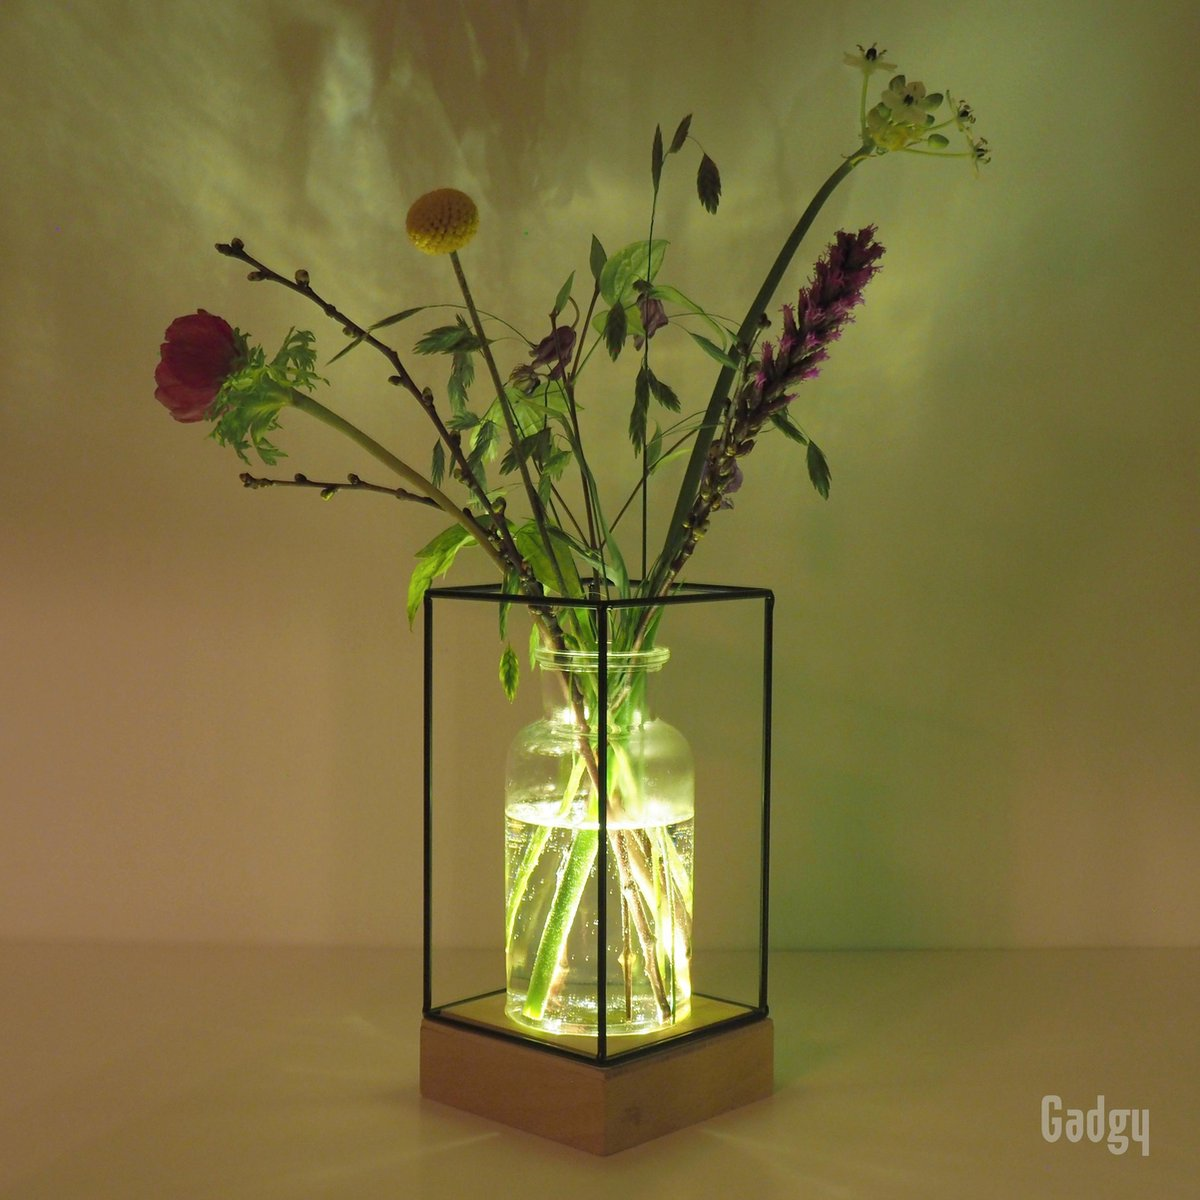 Gadgy Vaaslamp - Vaas met LED verlichting   Houten basis met 5 LED lampjes, glazen vaas en zwart met